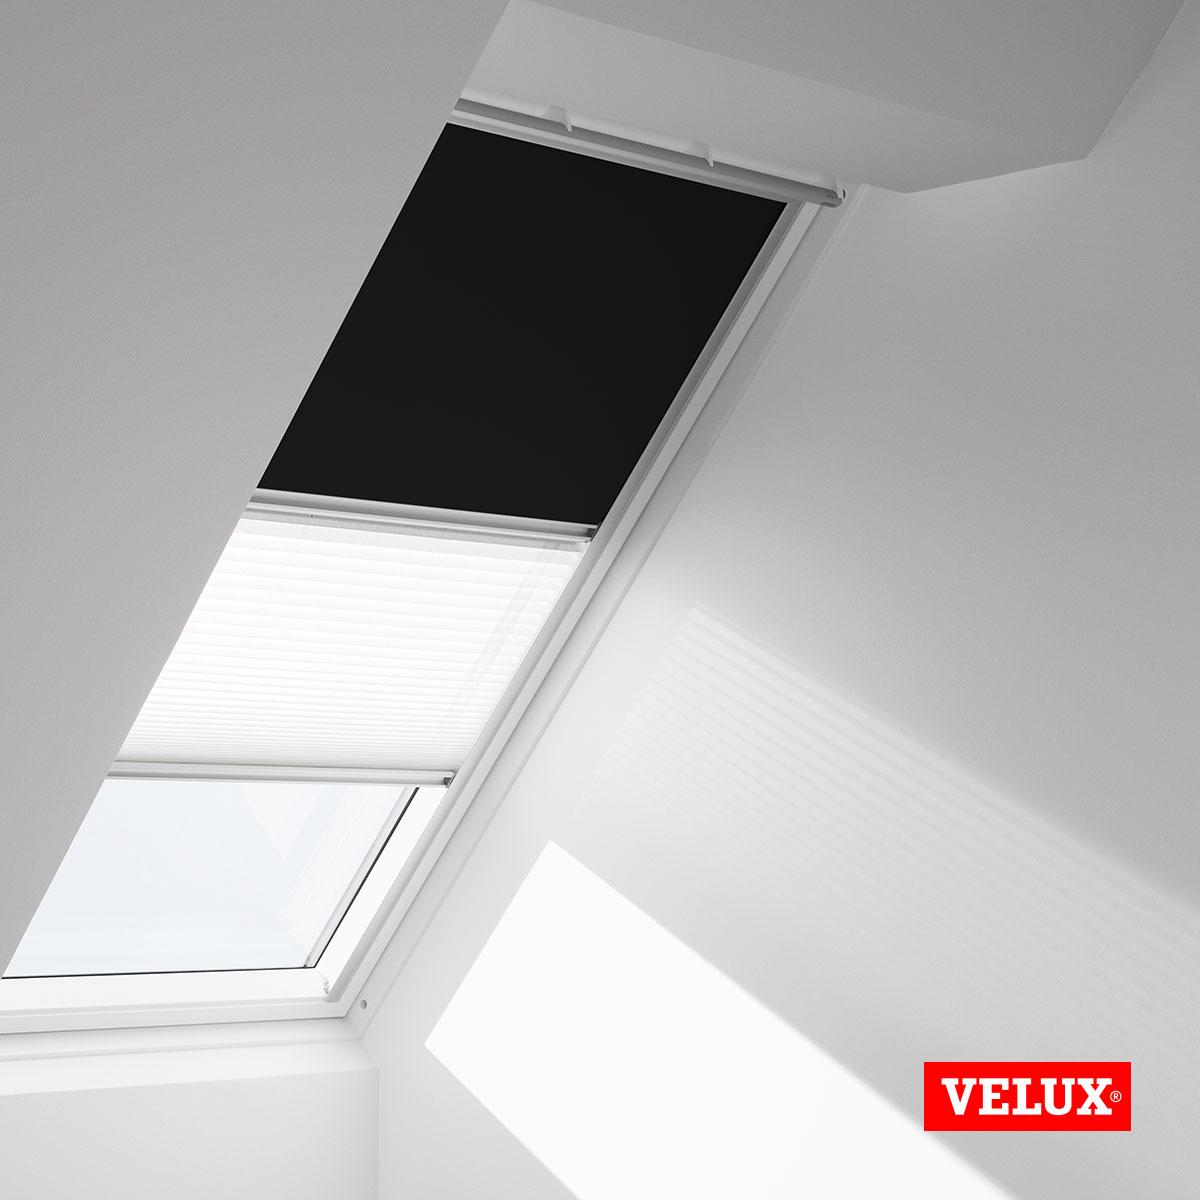 velux ggu ck02 bathroom roof window velux ggu ck with obscure glass cm x cm with velux ggu ck02. Black Bedroom Furniture Sets. Home Design Ideas